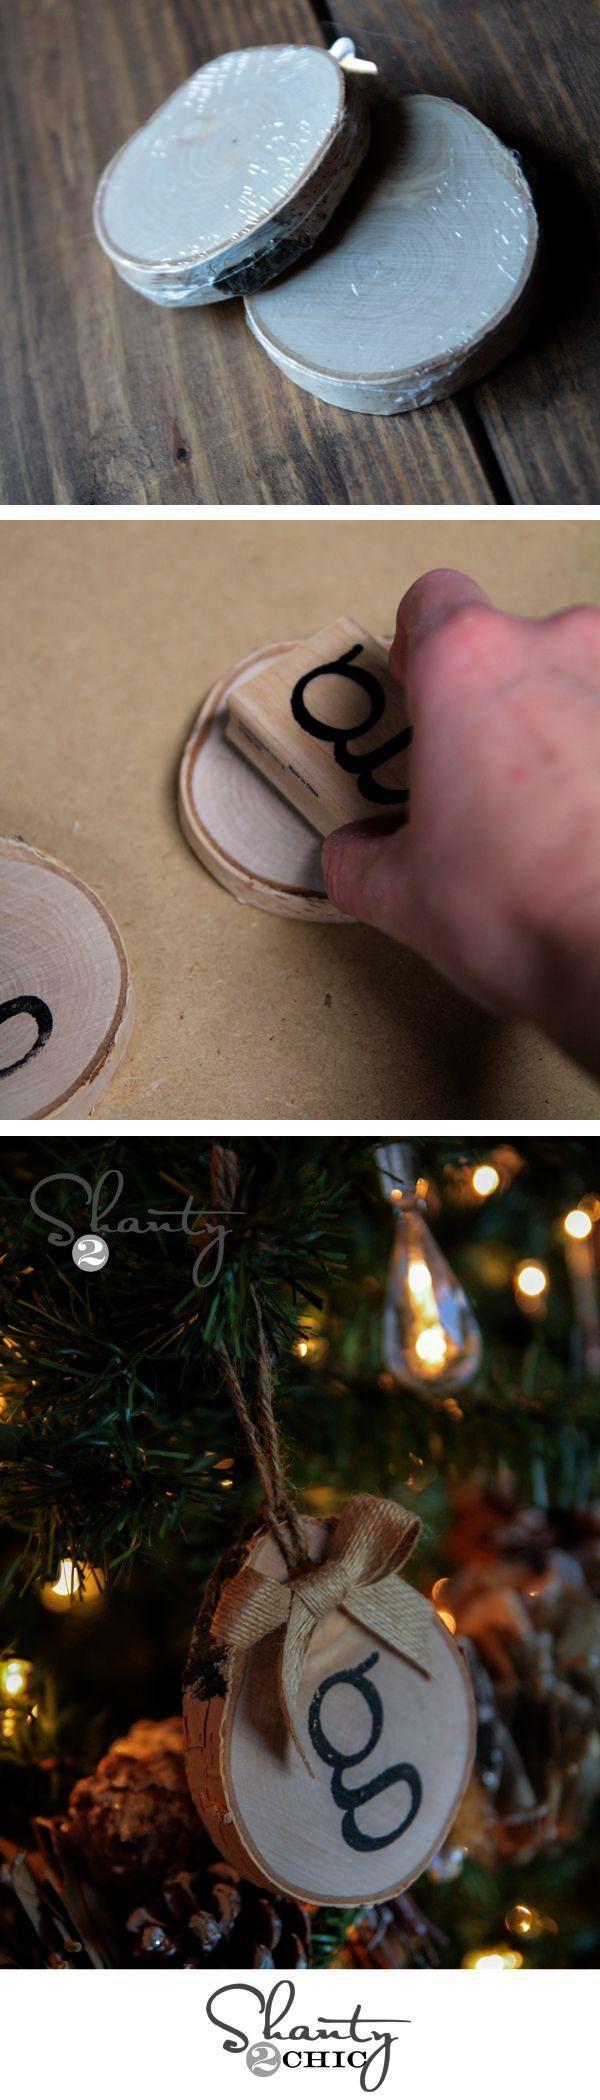 Bulk Christmas Ornaments To Personalize, Christmas